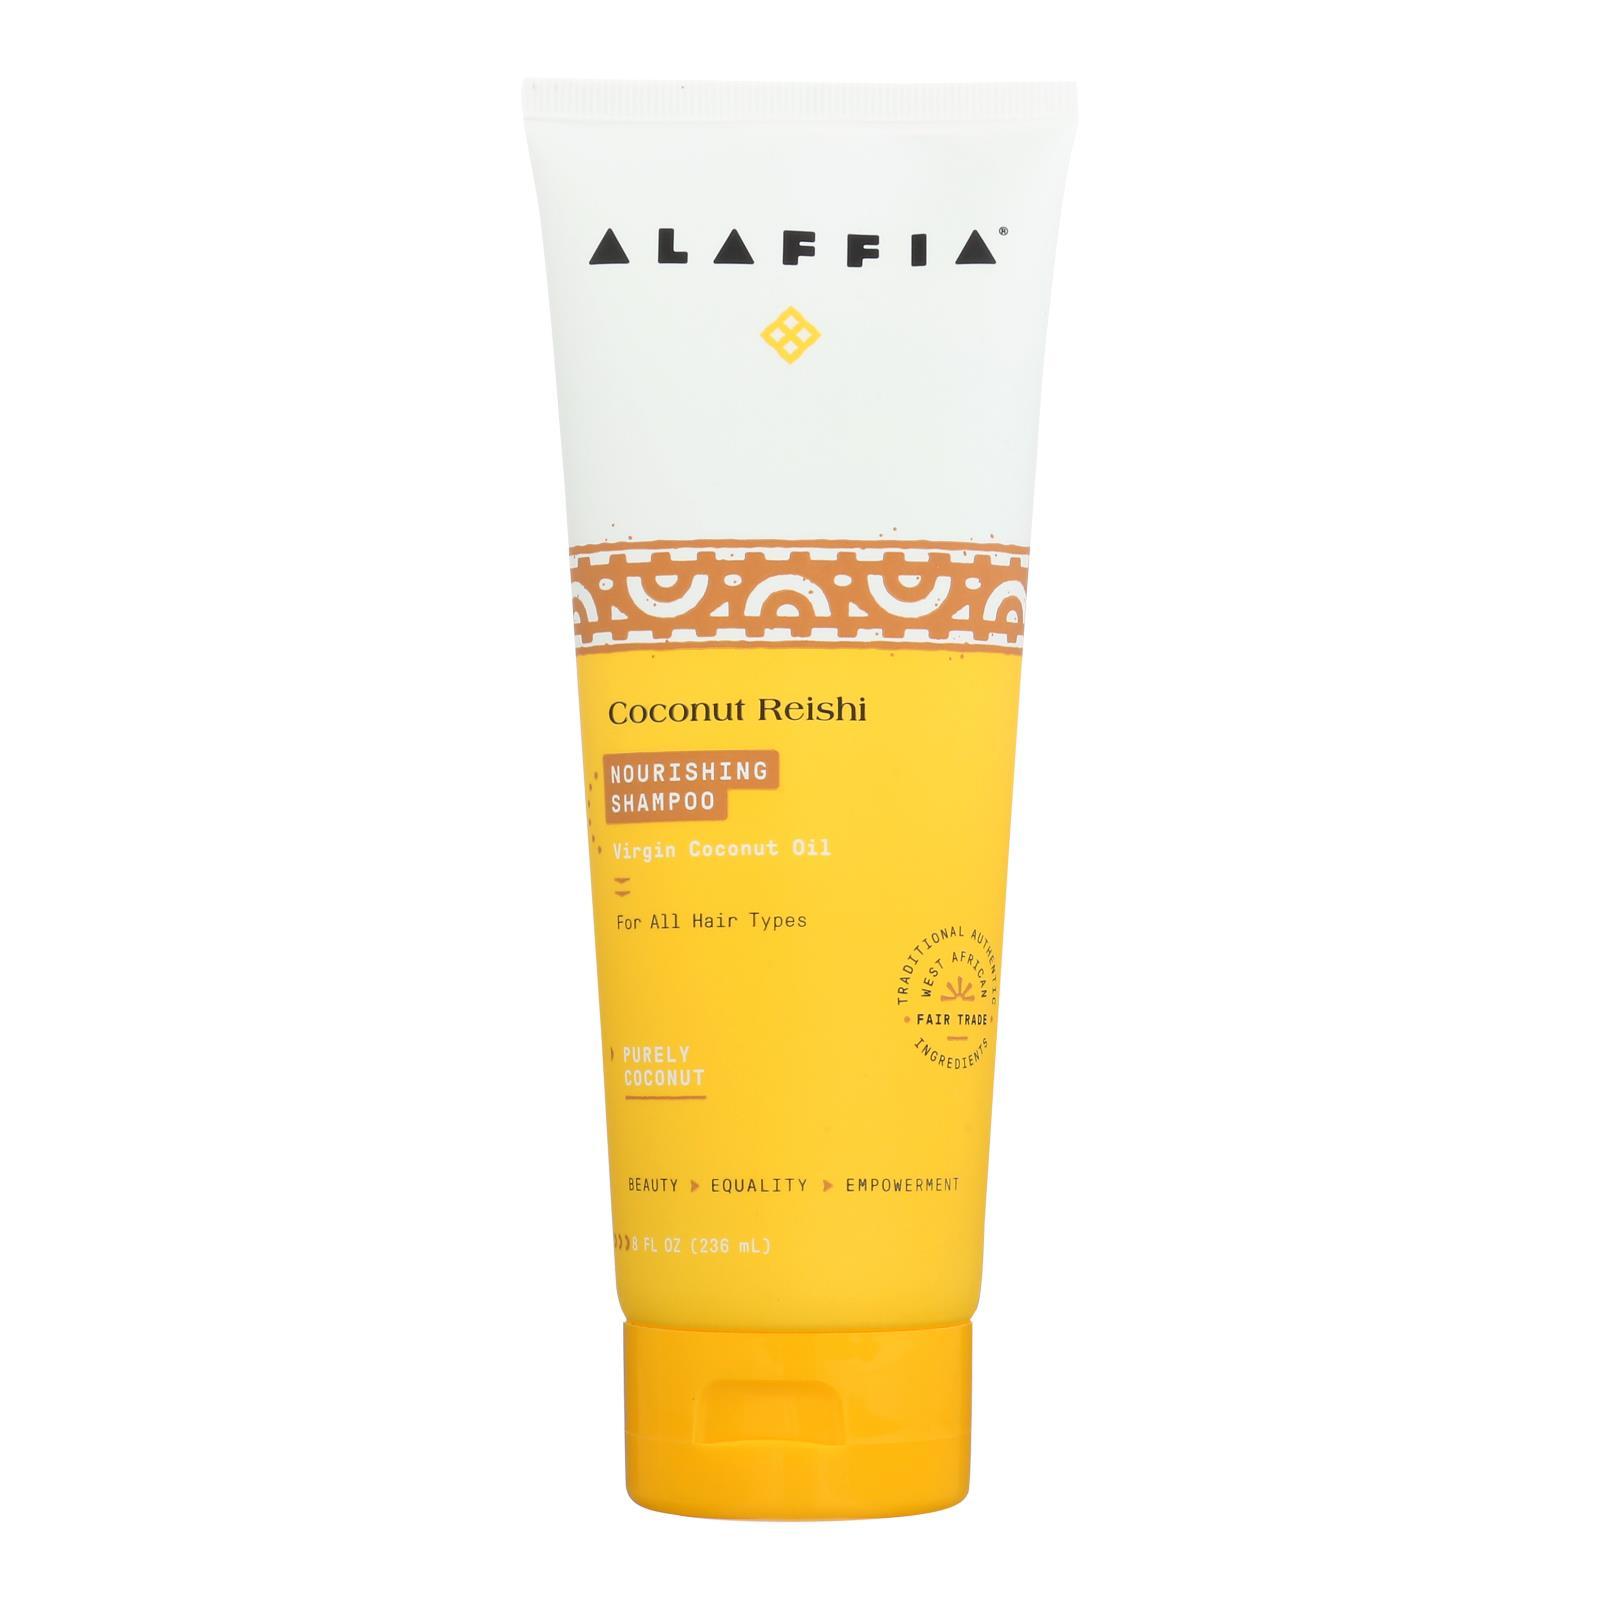 Alaffia - Shampoo Coconut Reishi - 8 fl oz.